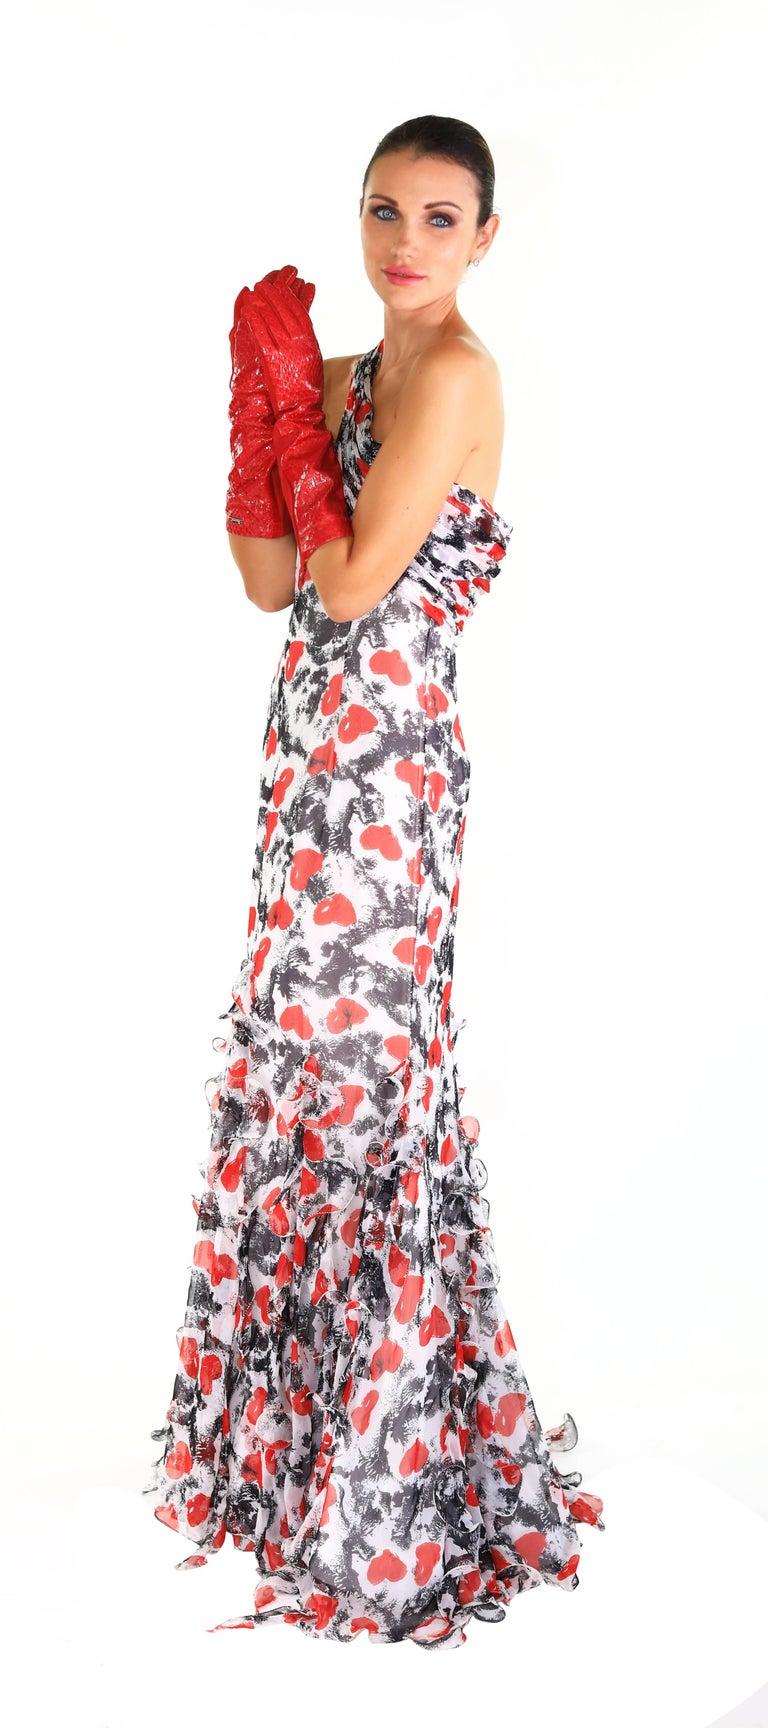 S/S 2011 Look # 50 OSCAR de la RENTA HEART PRINT GOWN 3